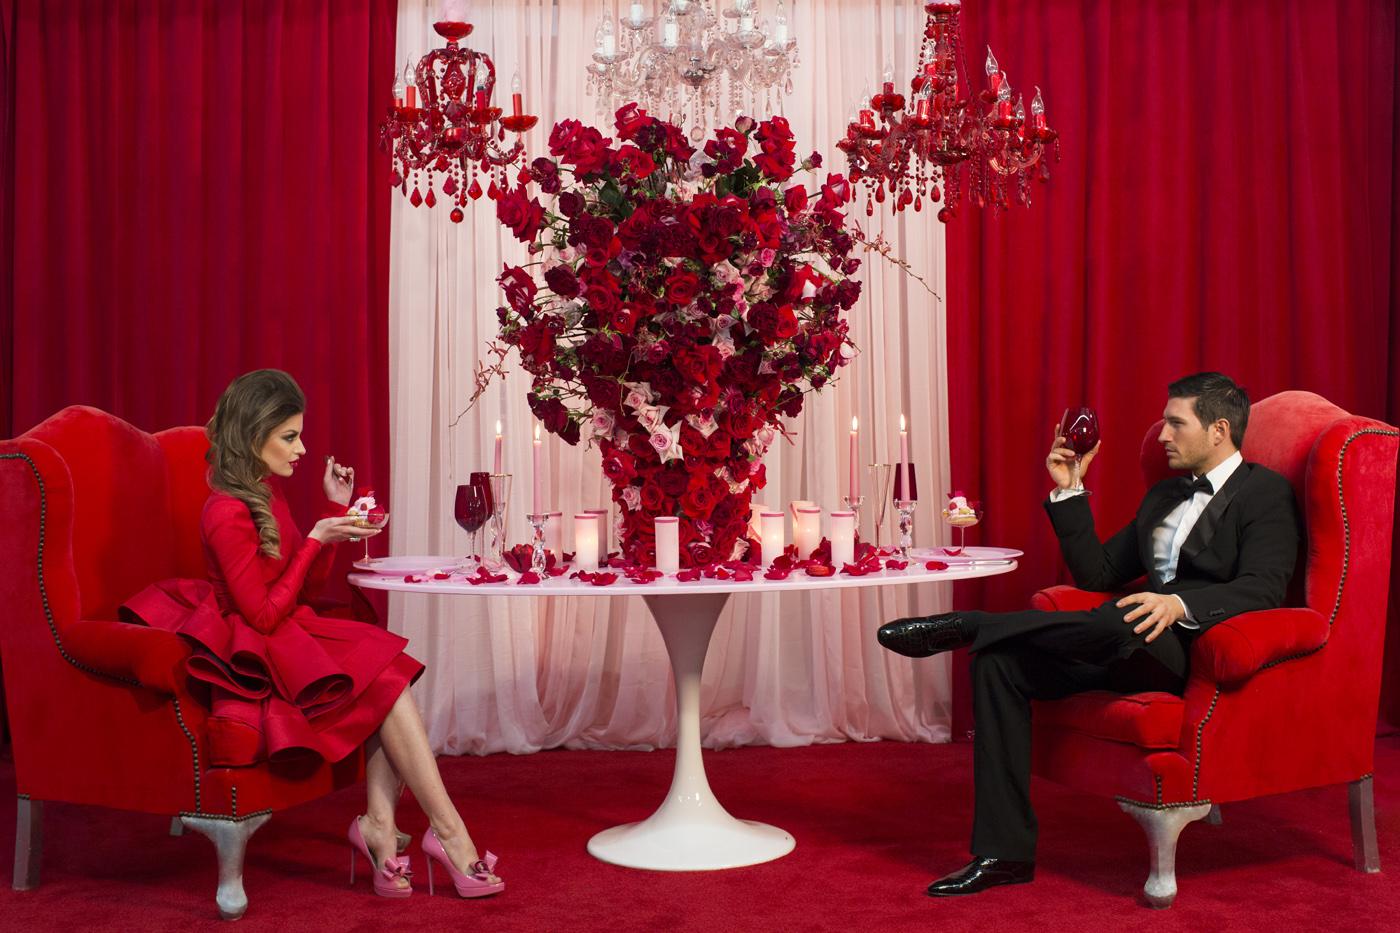 006_DukePhotography_DukeImages_Editorial_Valentines.jpg